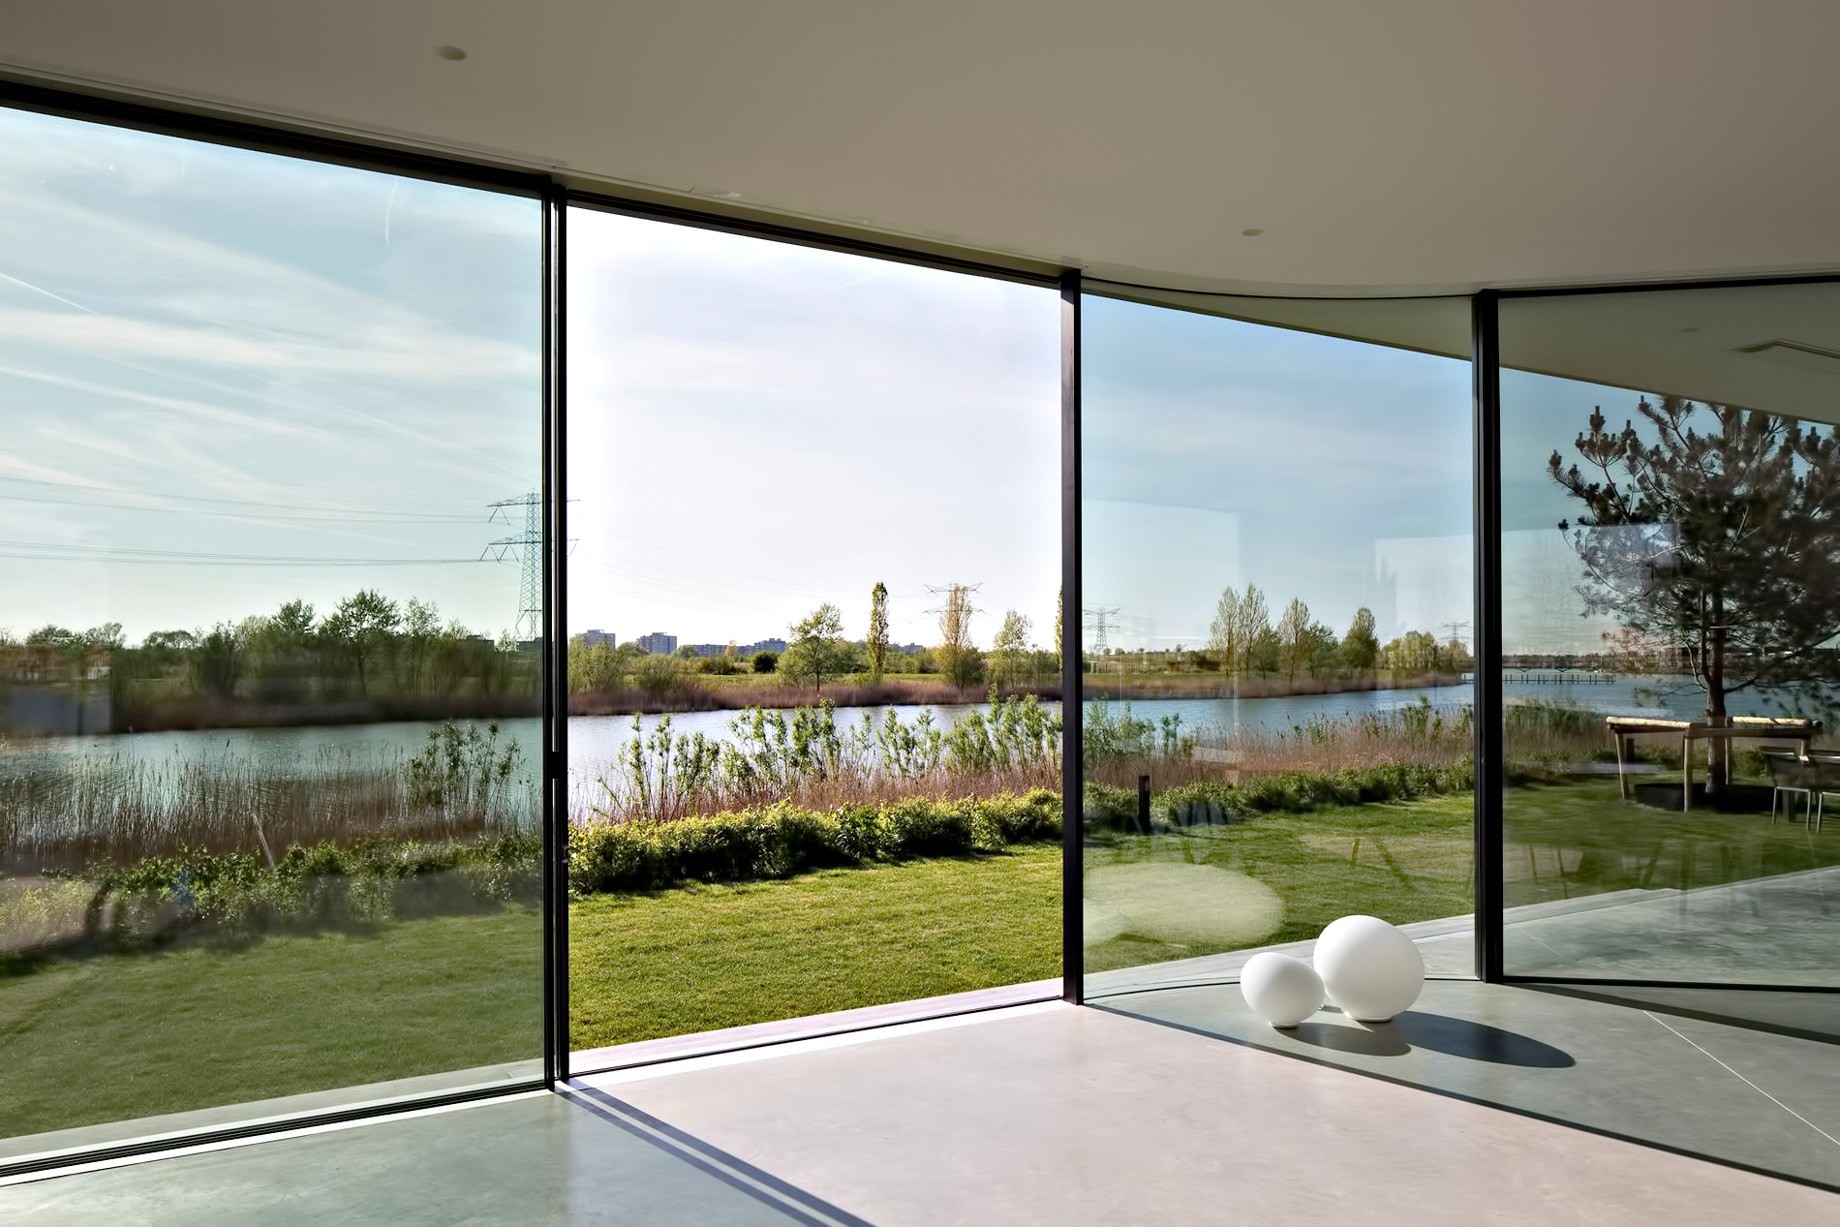 Villa Kavel Luxury Residence - Amsterdam, North Holland, Netherlands